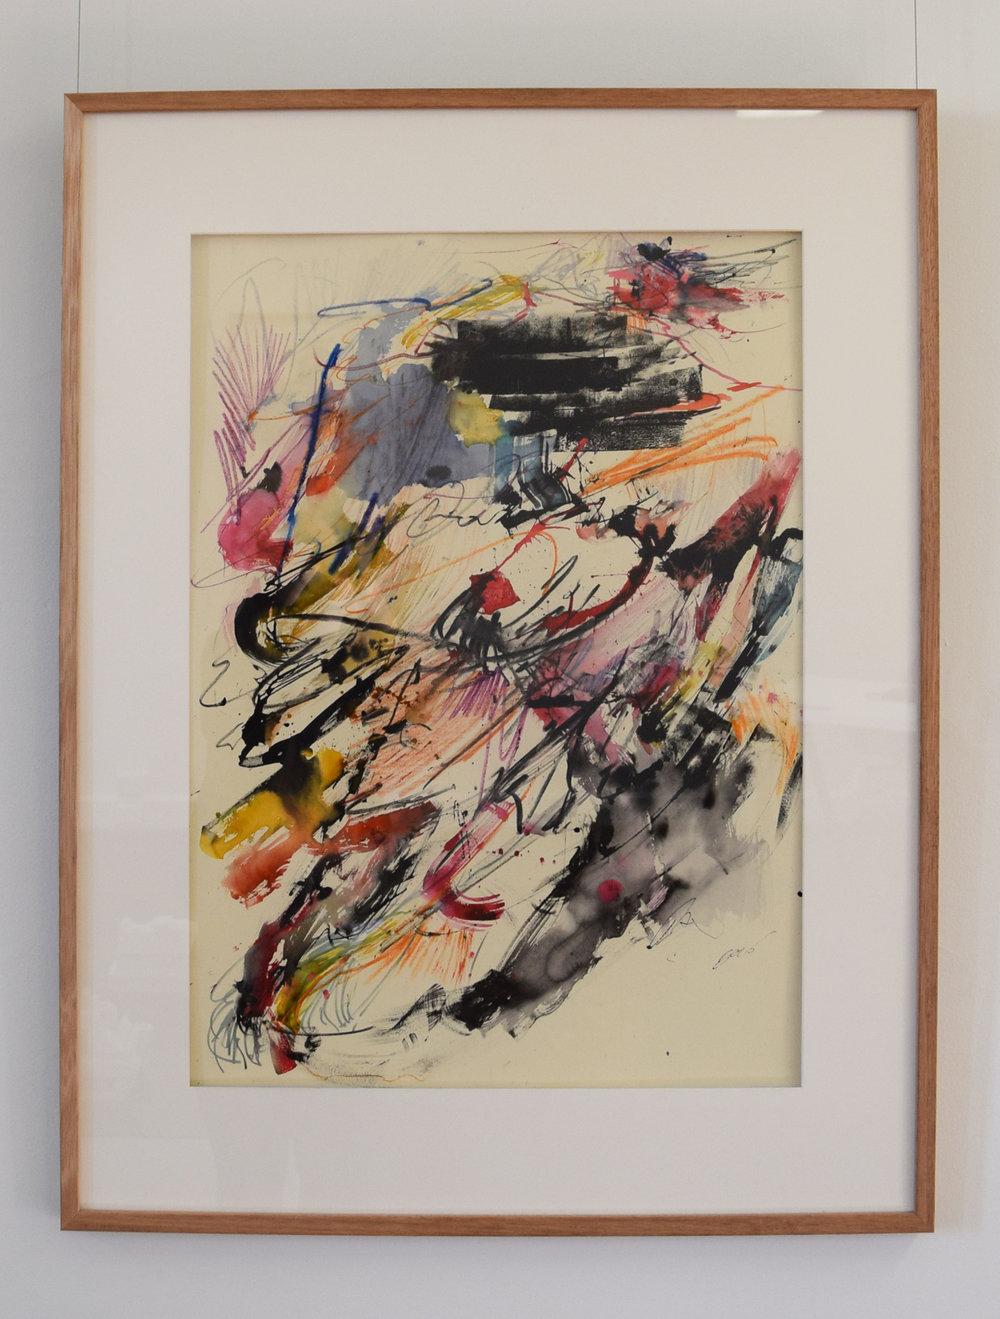 28. Rory Dax Paton,  Euro Pastel #1 , 2018, mixed media on pastel papaer, 93 x 72 cm $1,200